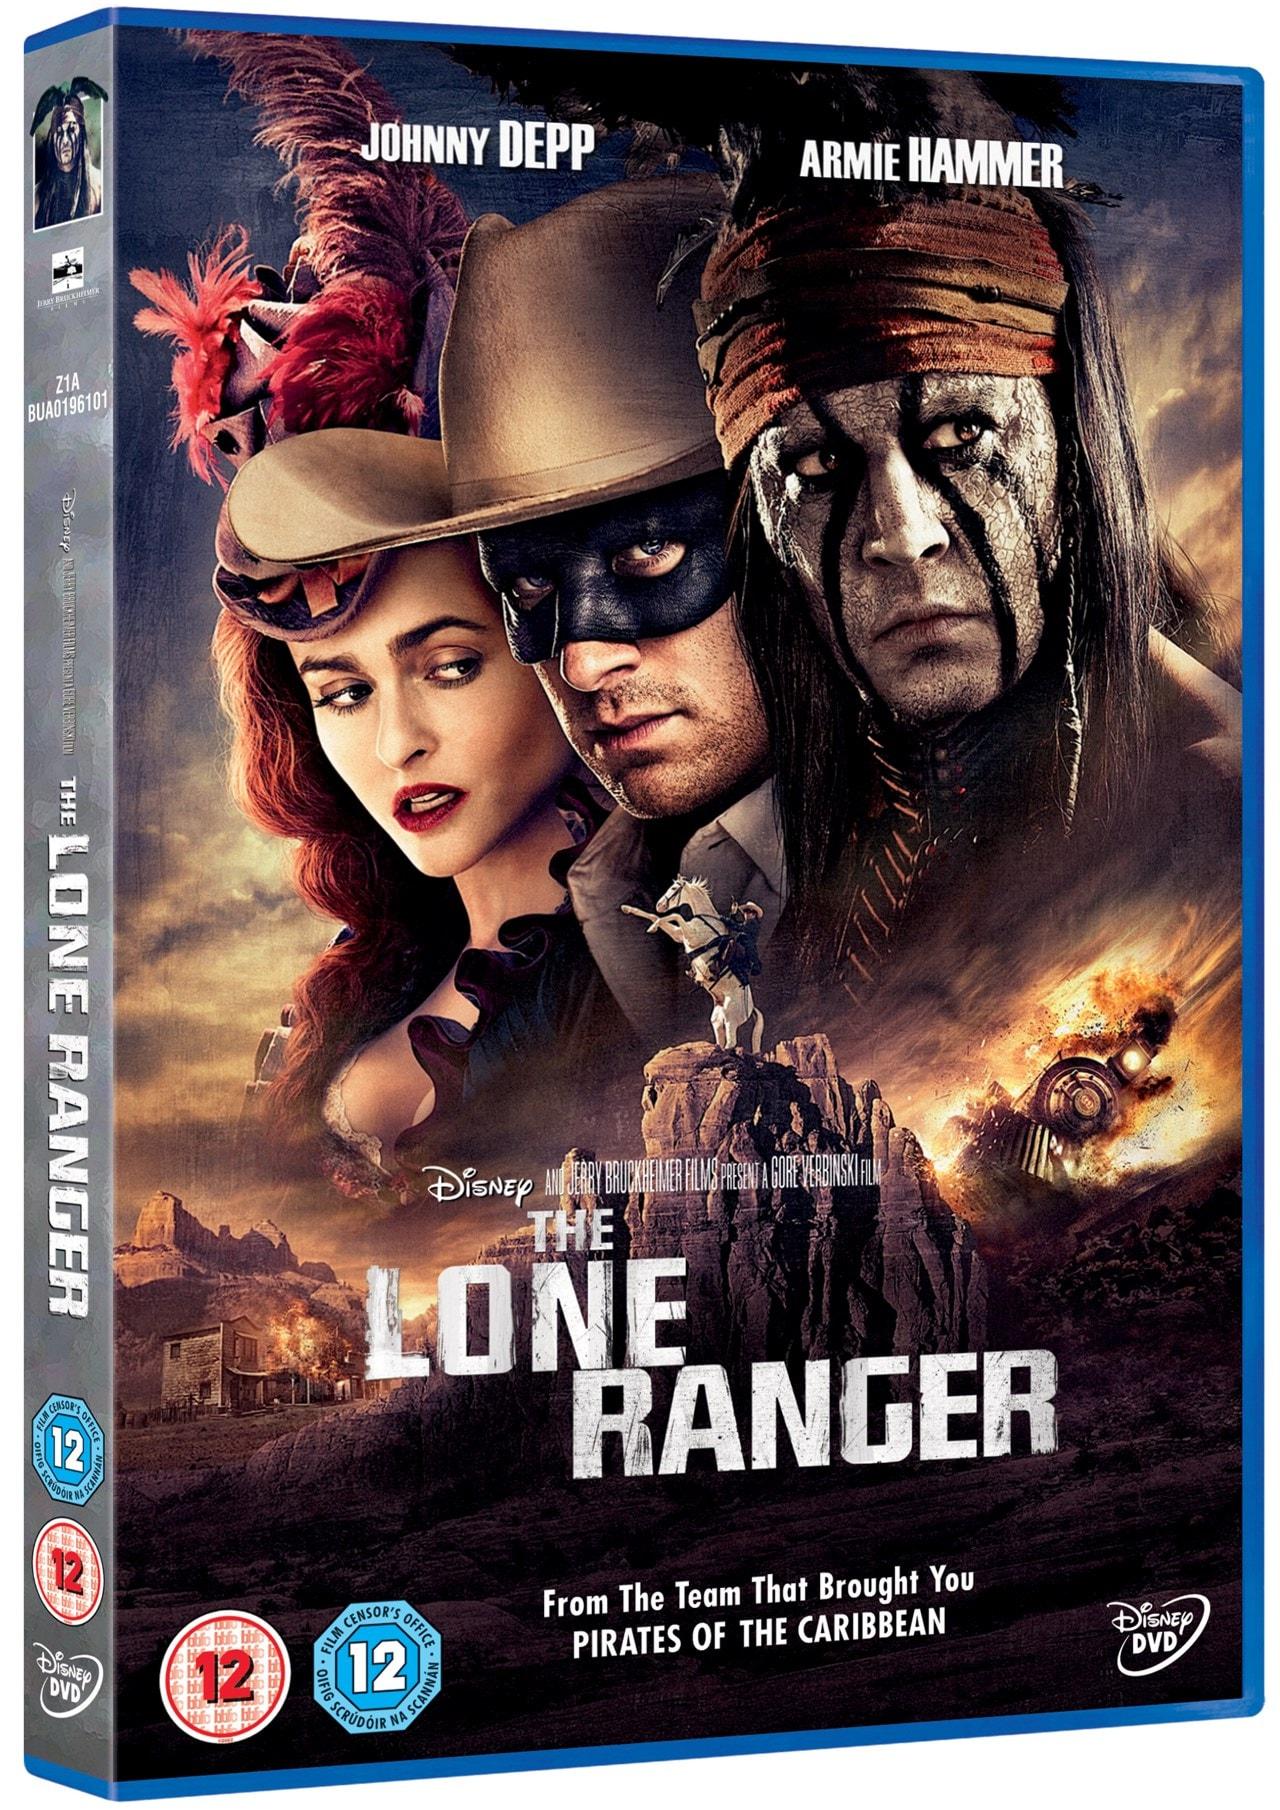 The Lone Ranger - 2